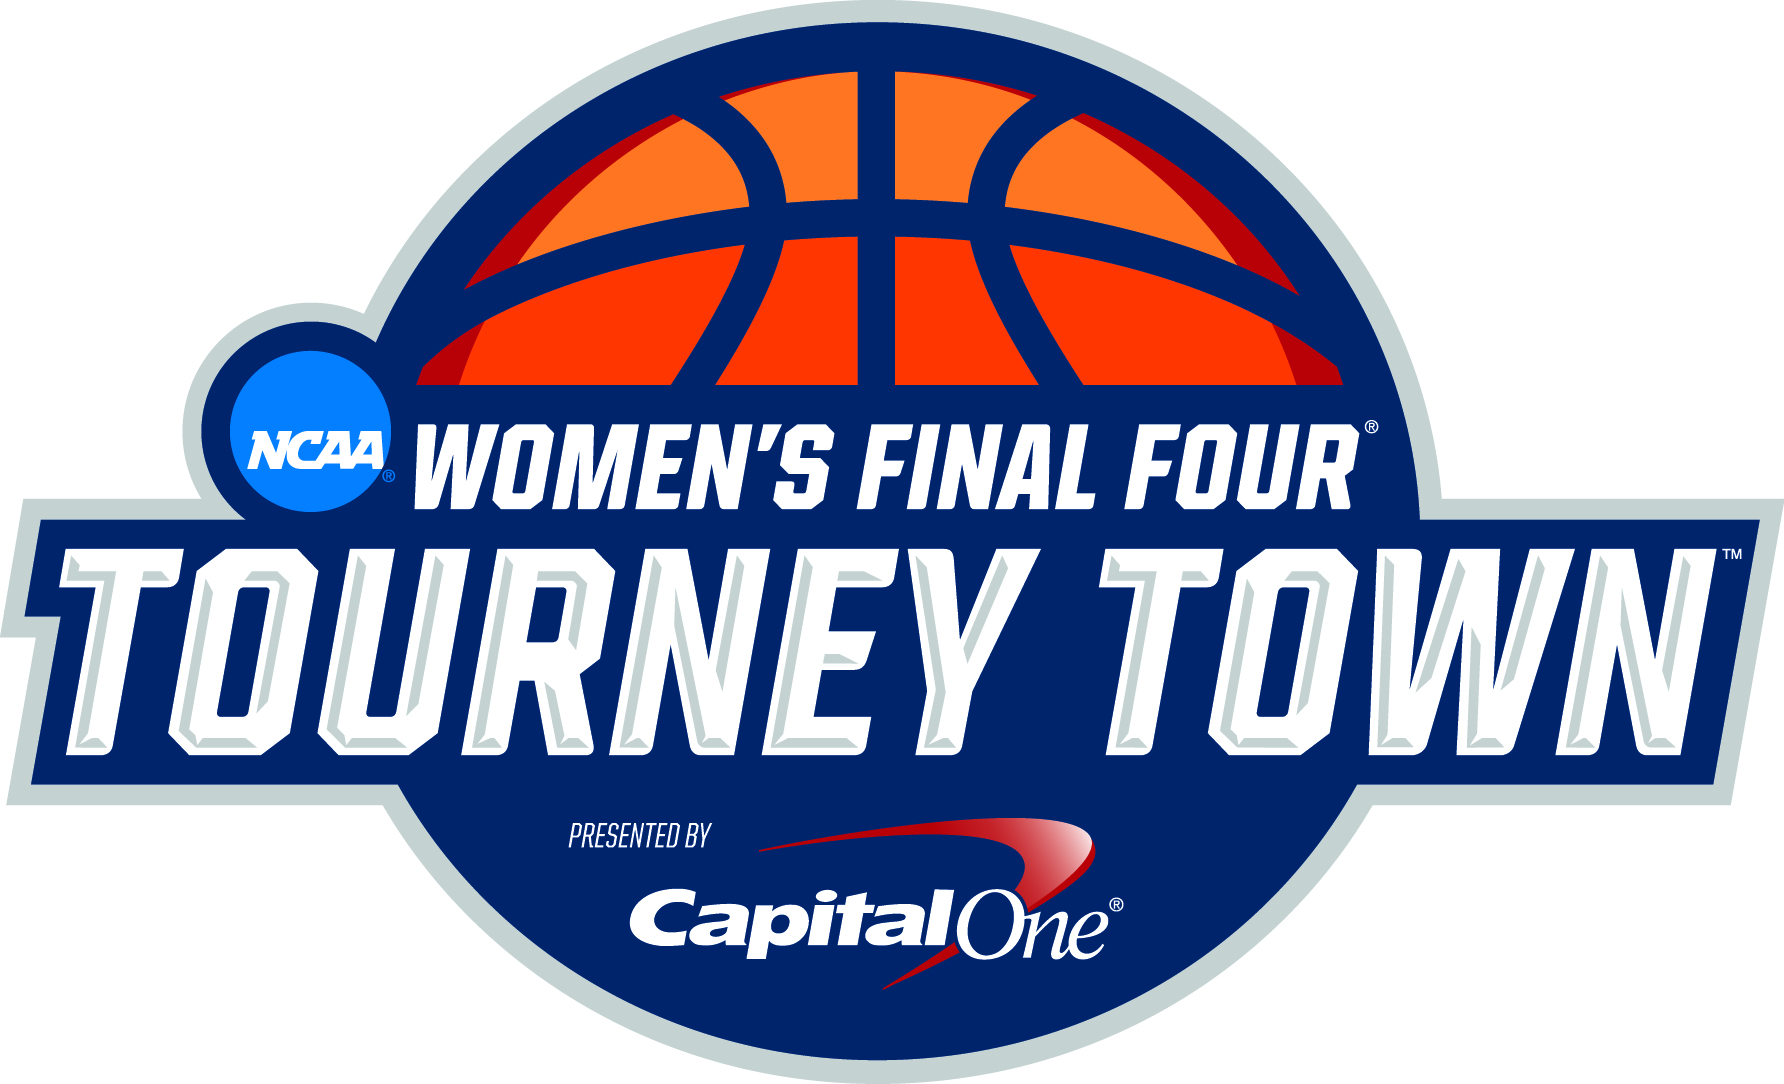 NCAA- Women's Final Four Tourney Town logo